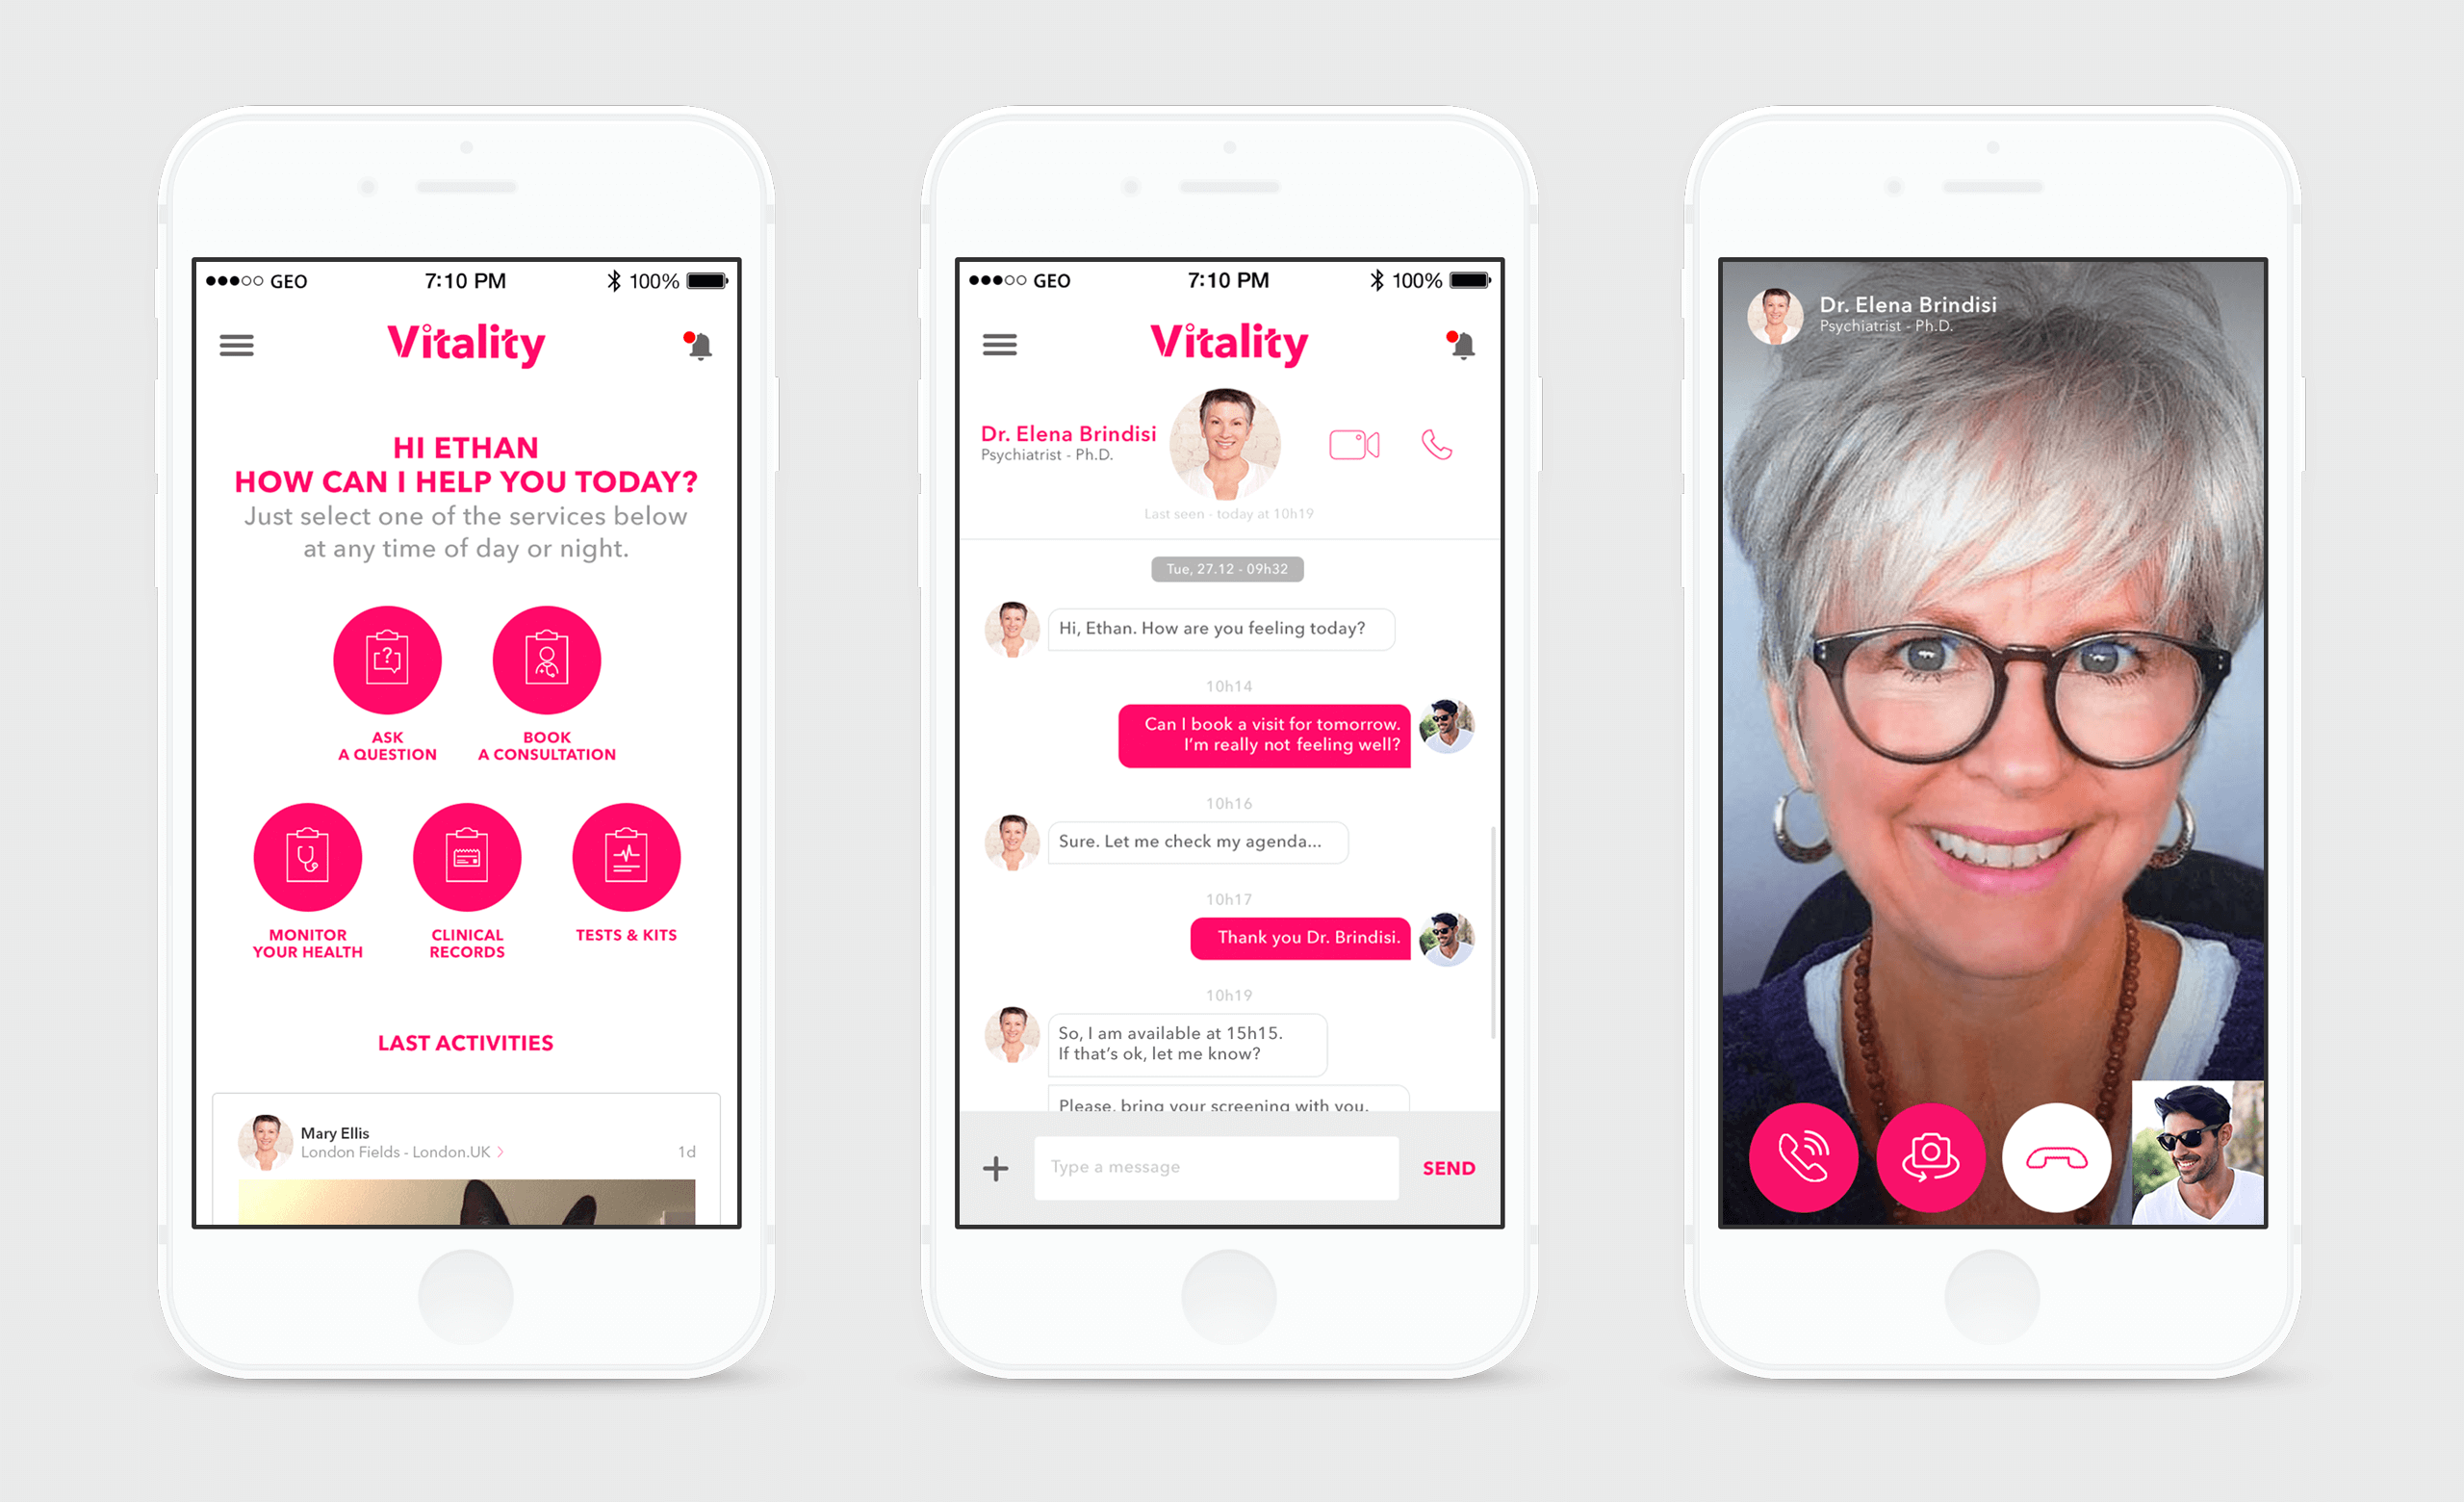 _VITALITY-App-vitality-GP-01